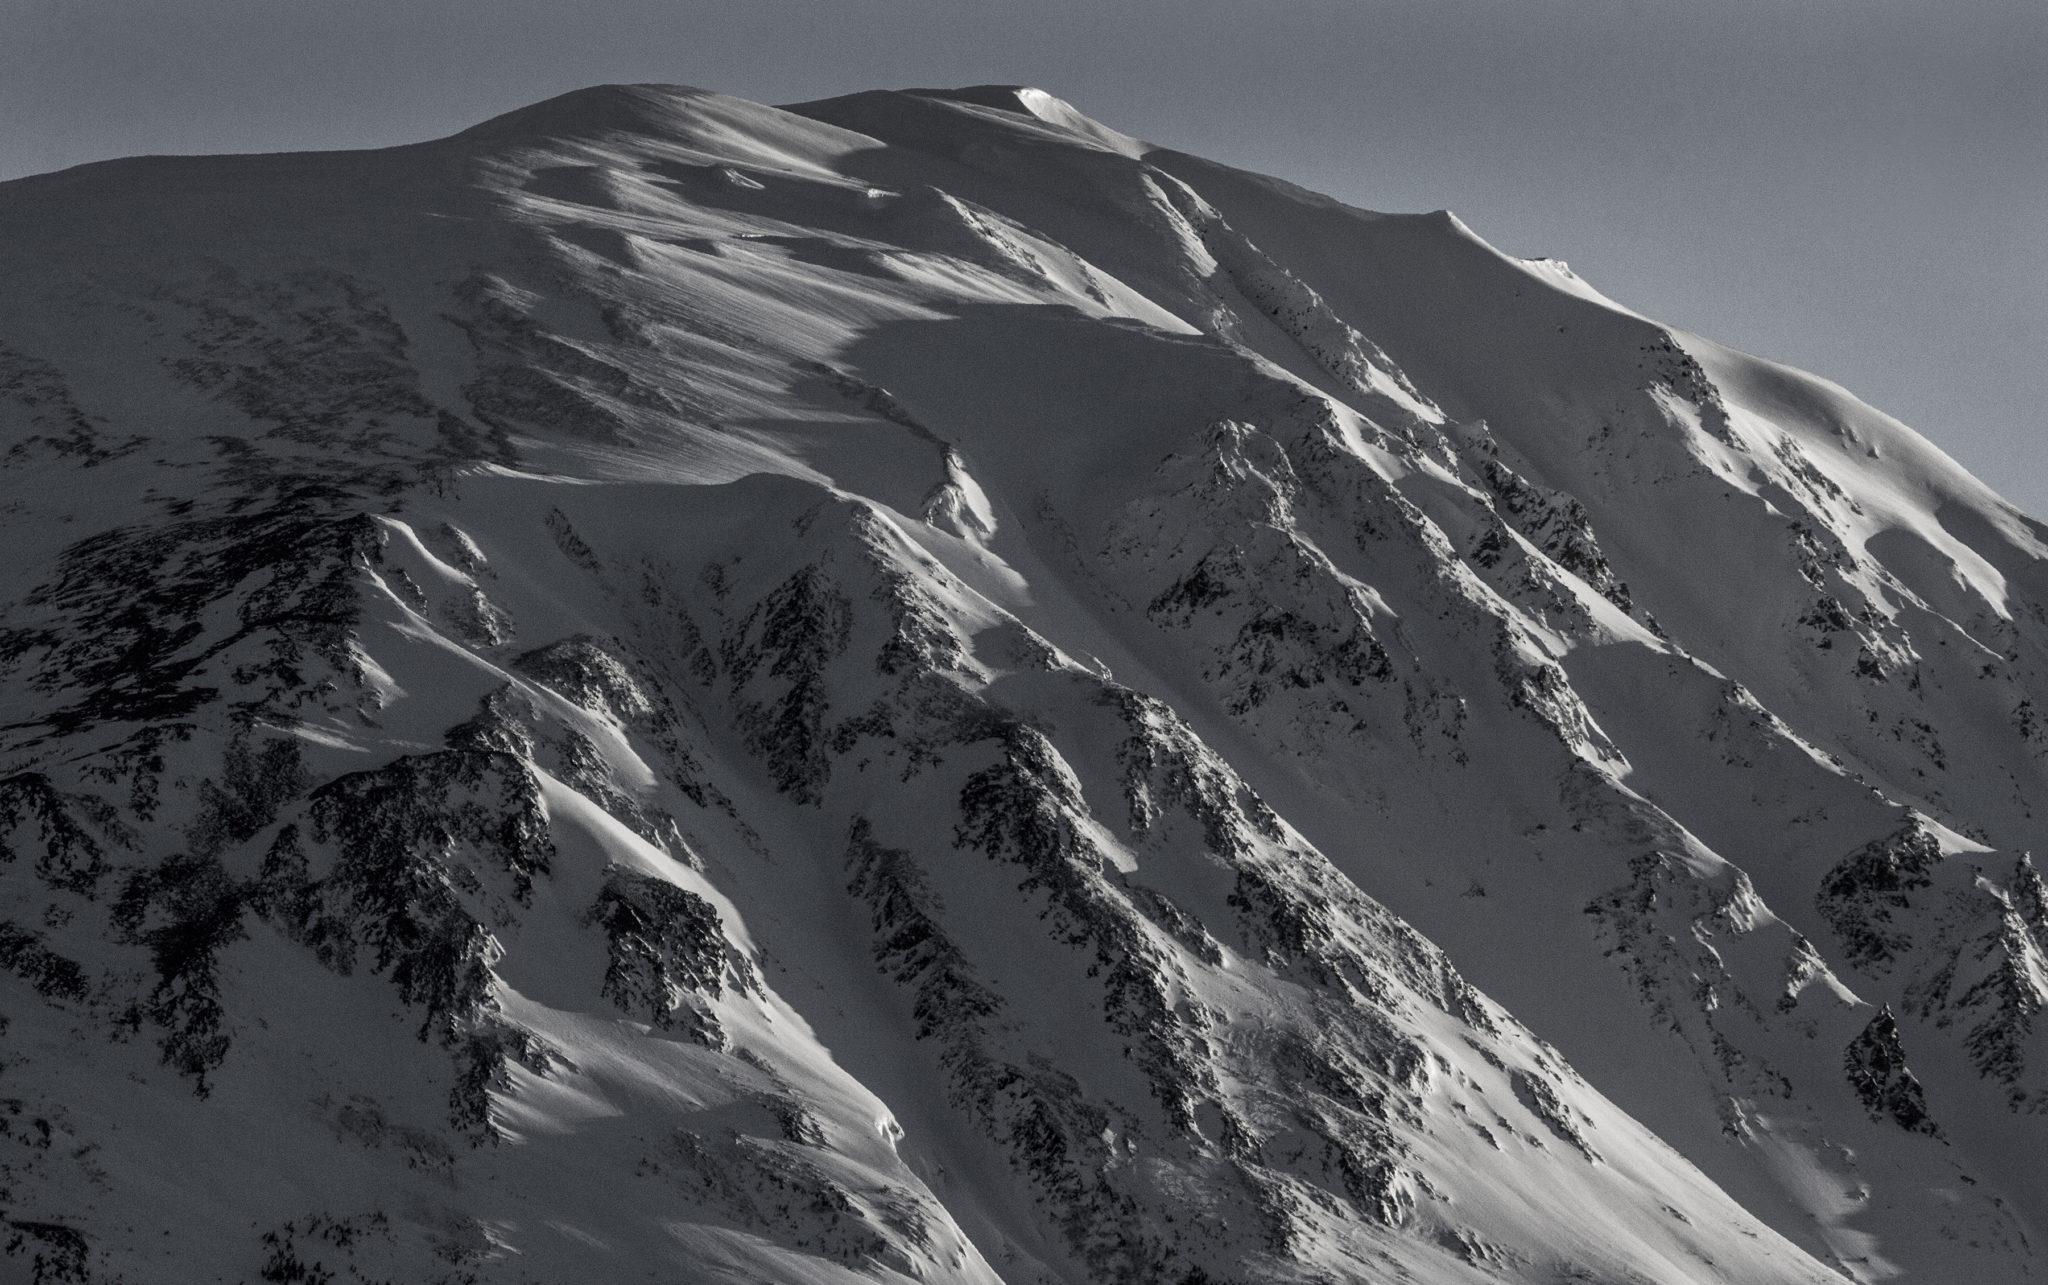 peaks around the Turnagain Arm, south of Anchorage - Alaska photography   Alaskafoto